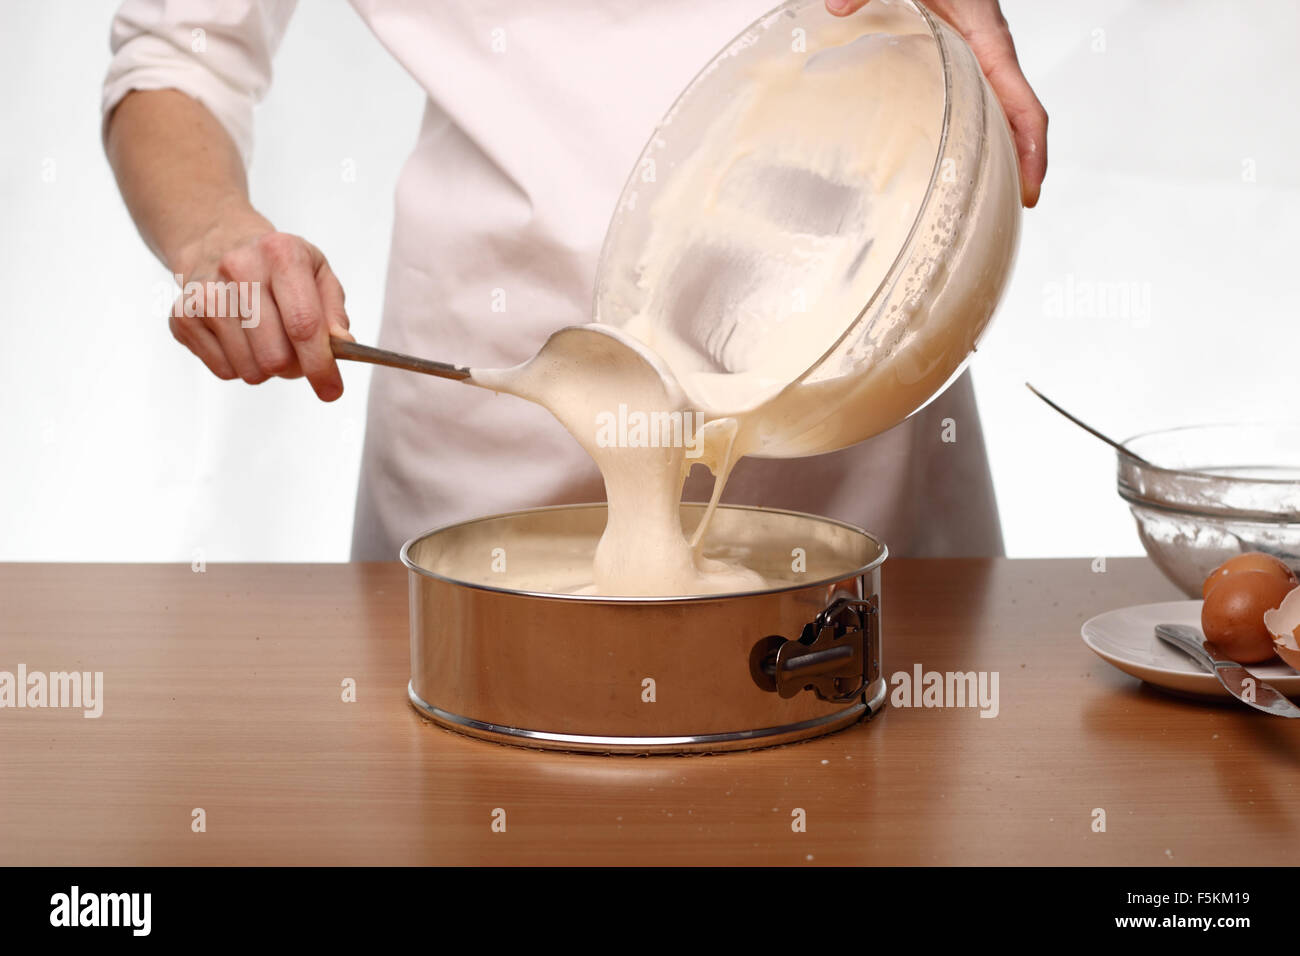 Making Pound Cake Into Cupcakes